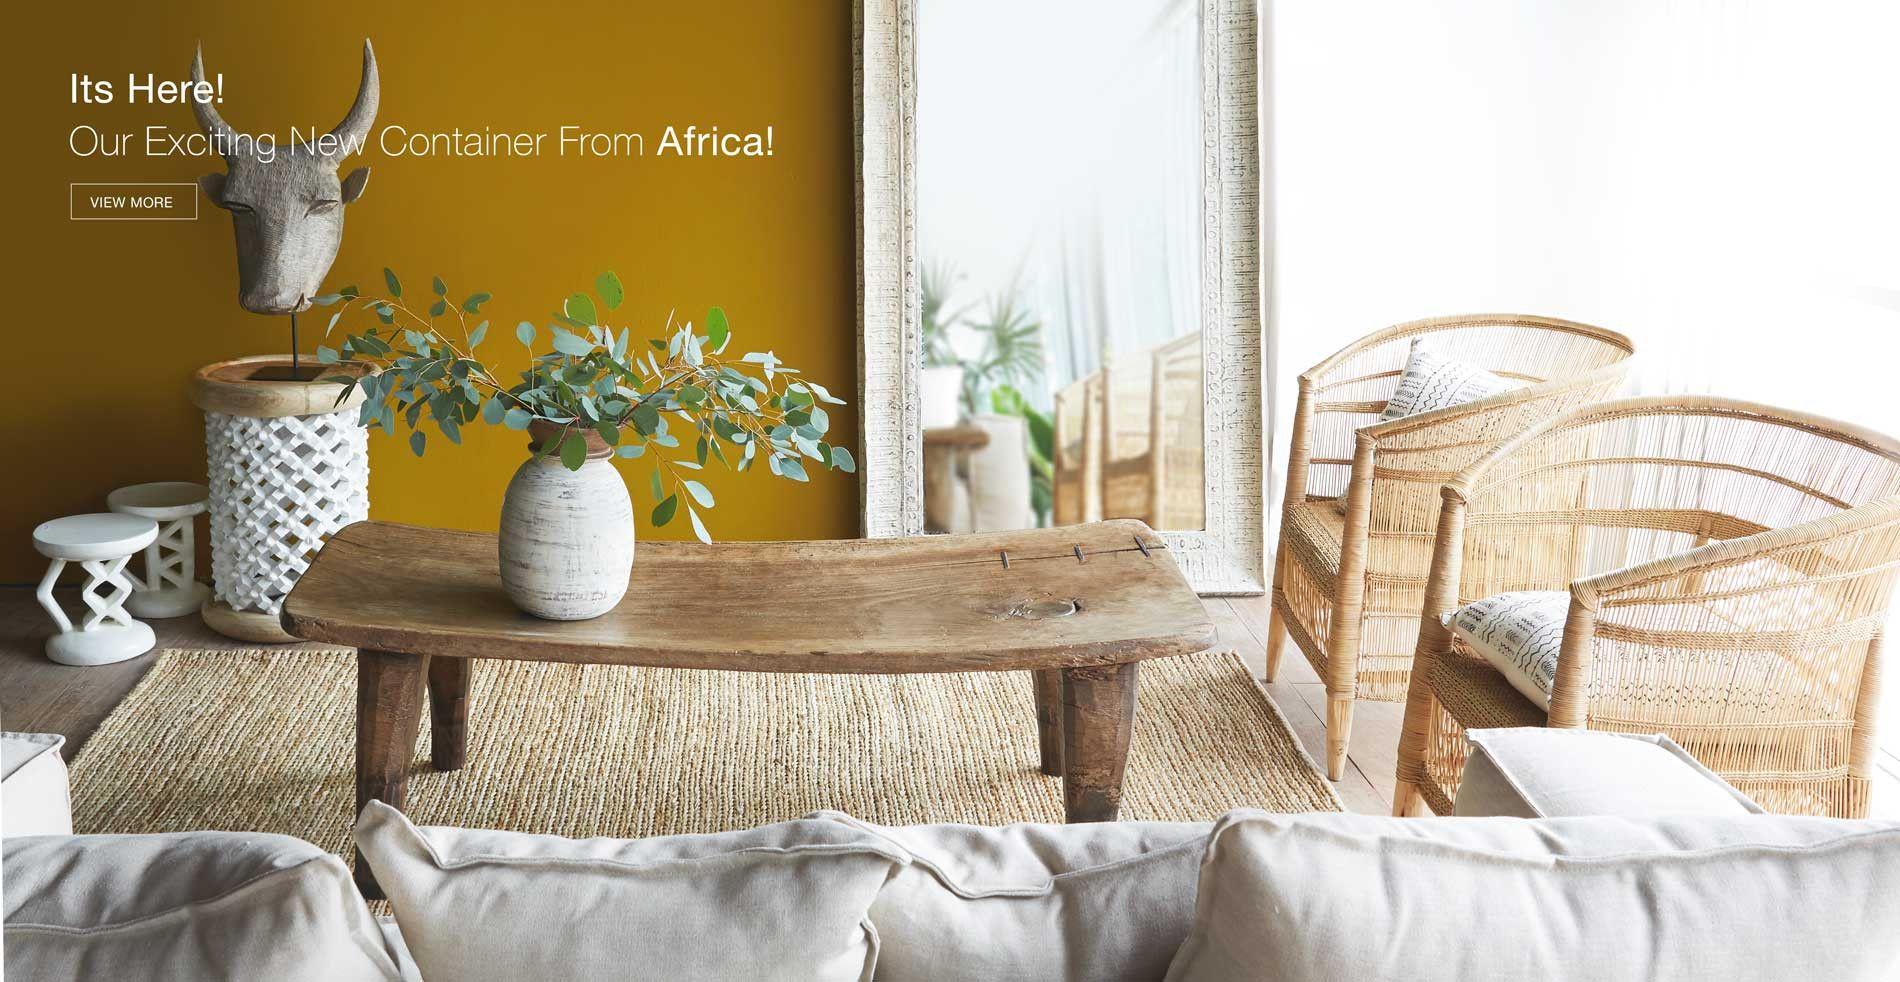 Originals Furniture U2022 Originals Furniture Singapore   Great Quality,  Affordable U0026 Free Deliv